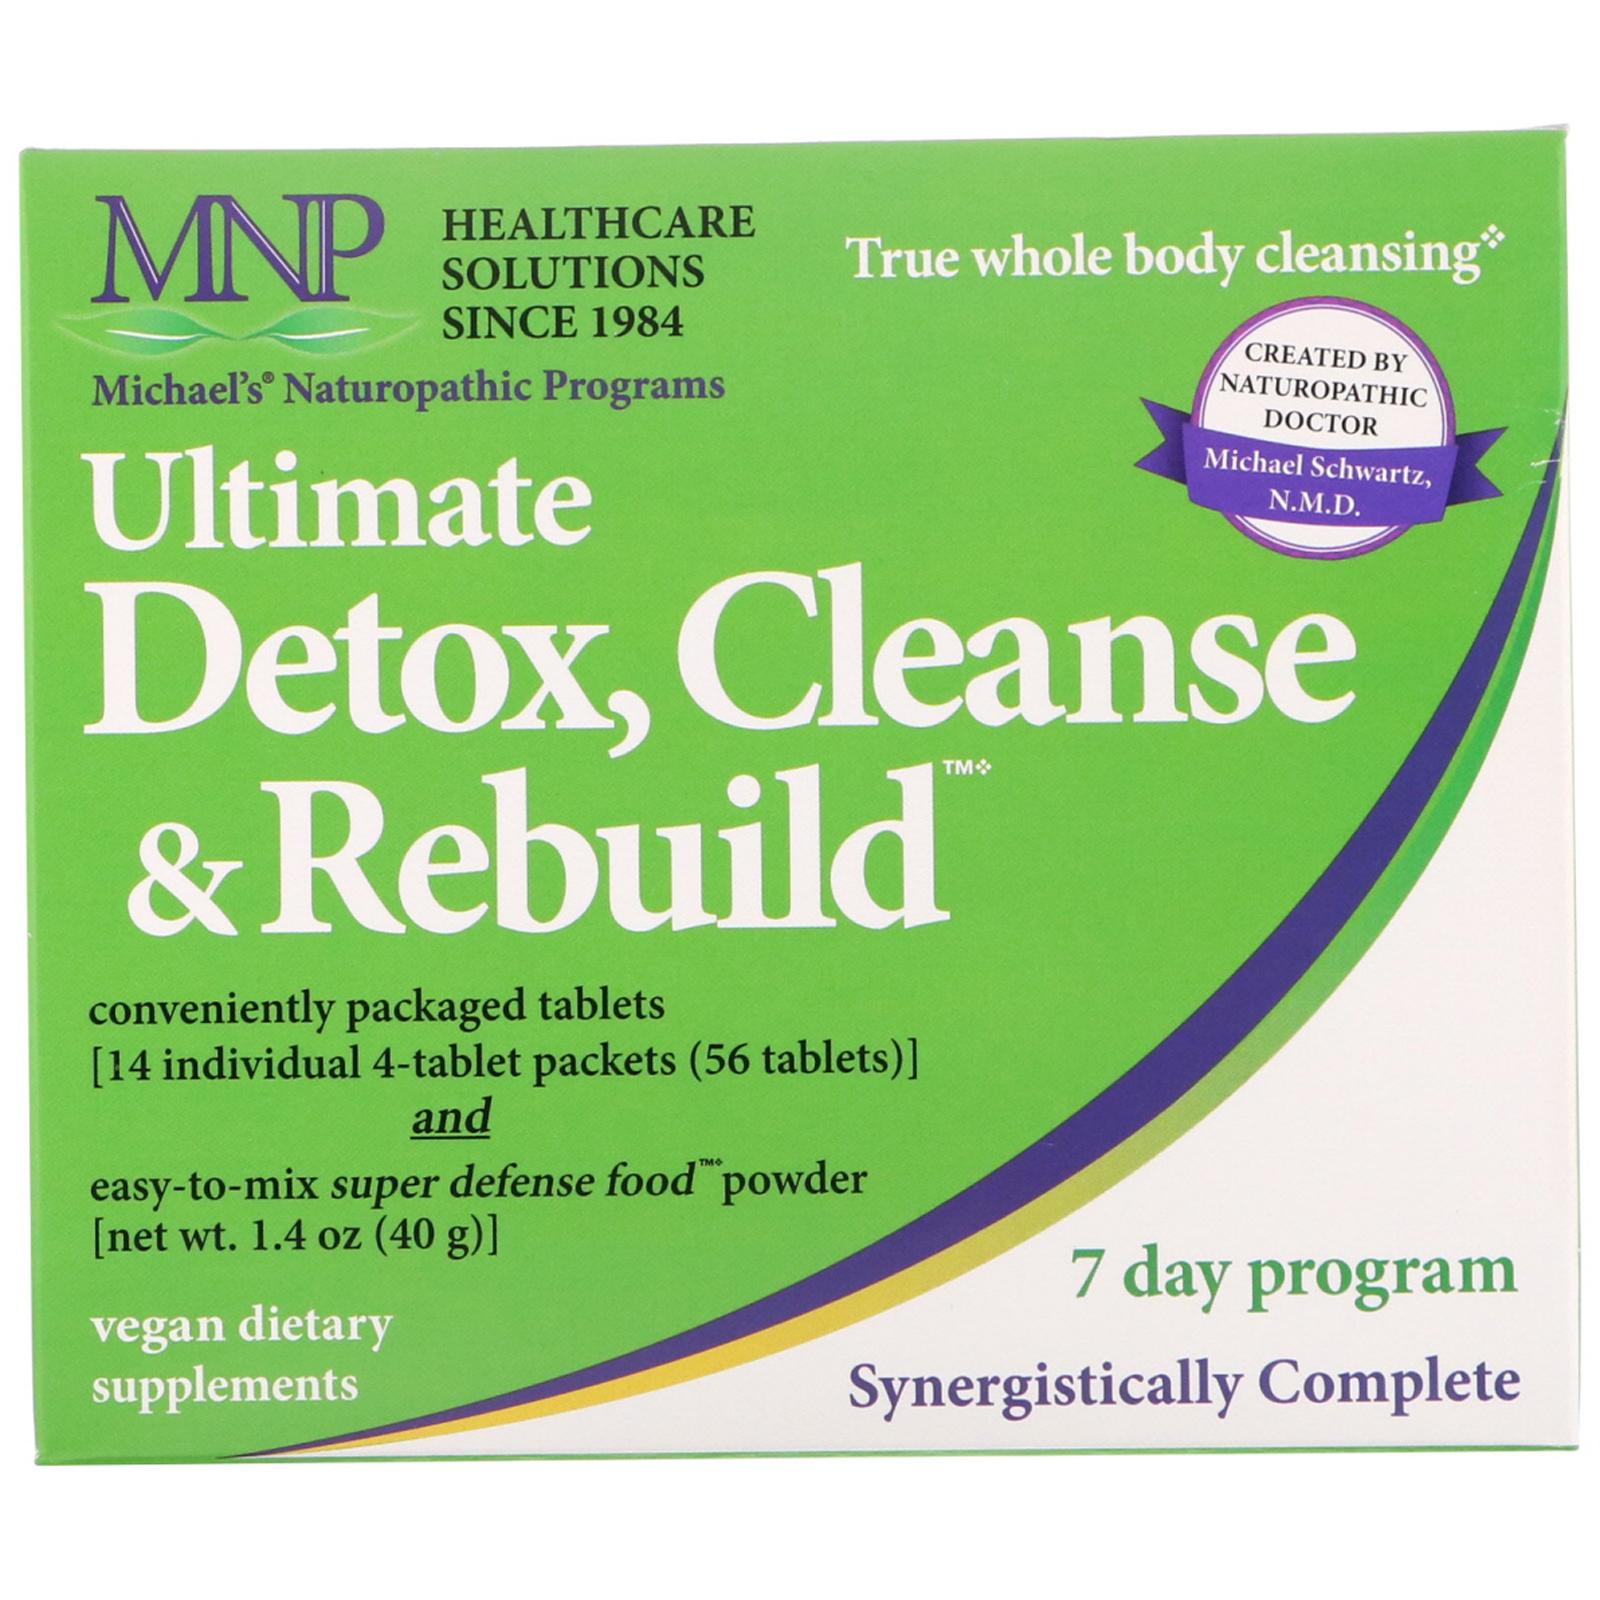 Michaels Naturopathic Ultimate Detox Cleanse Rebuild 7 Day Program